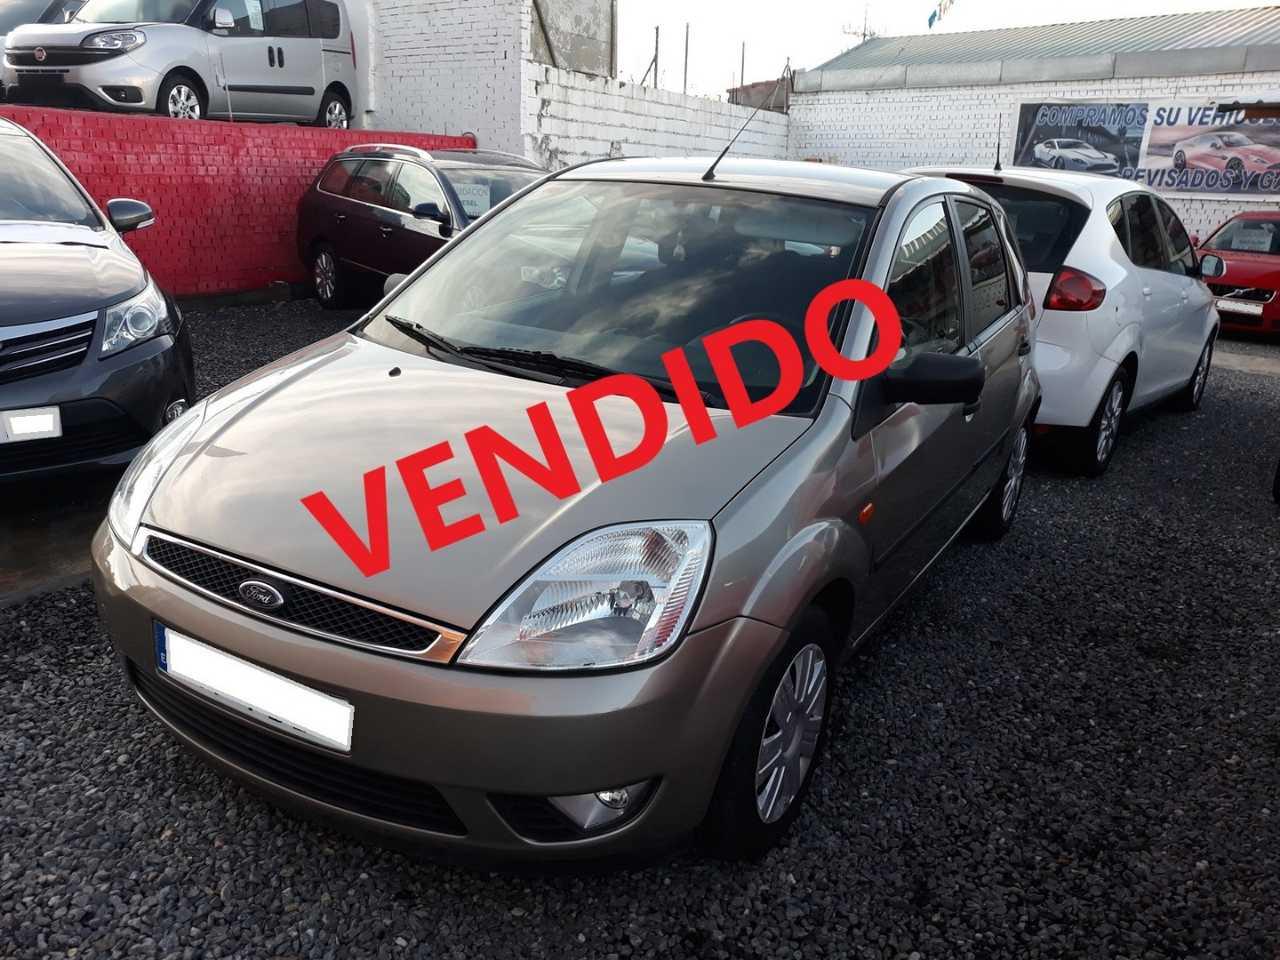 Ford Fiesta 1.4 TDCI TREND   - Foto 1